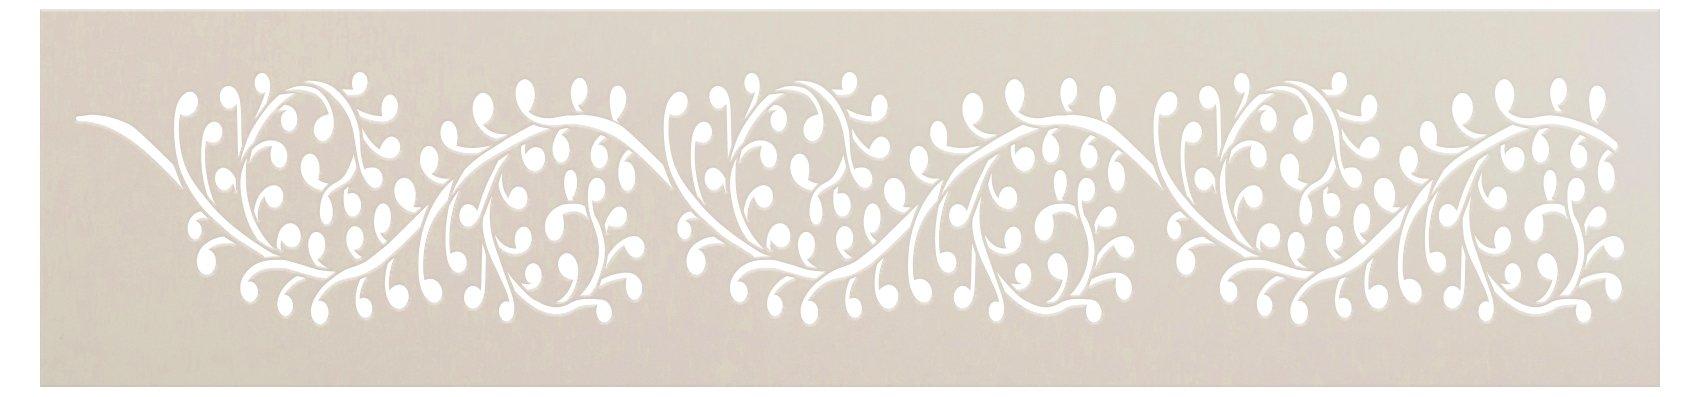 Indian Trailing Vine Band Stencil by StudioR12 | DIY Hindu Pattern Backsplash Home Decor | Craft & Paint Spiraling Wood Sign Border | Select Size